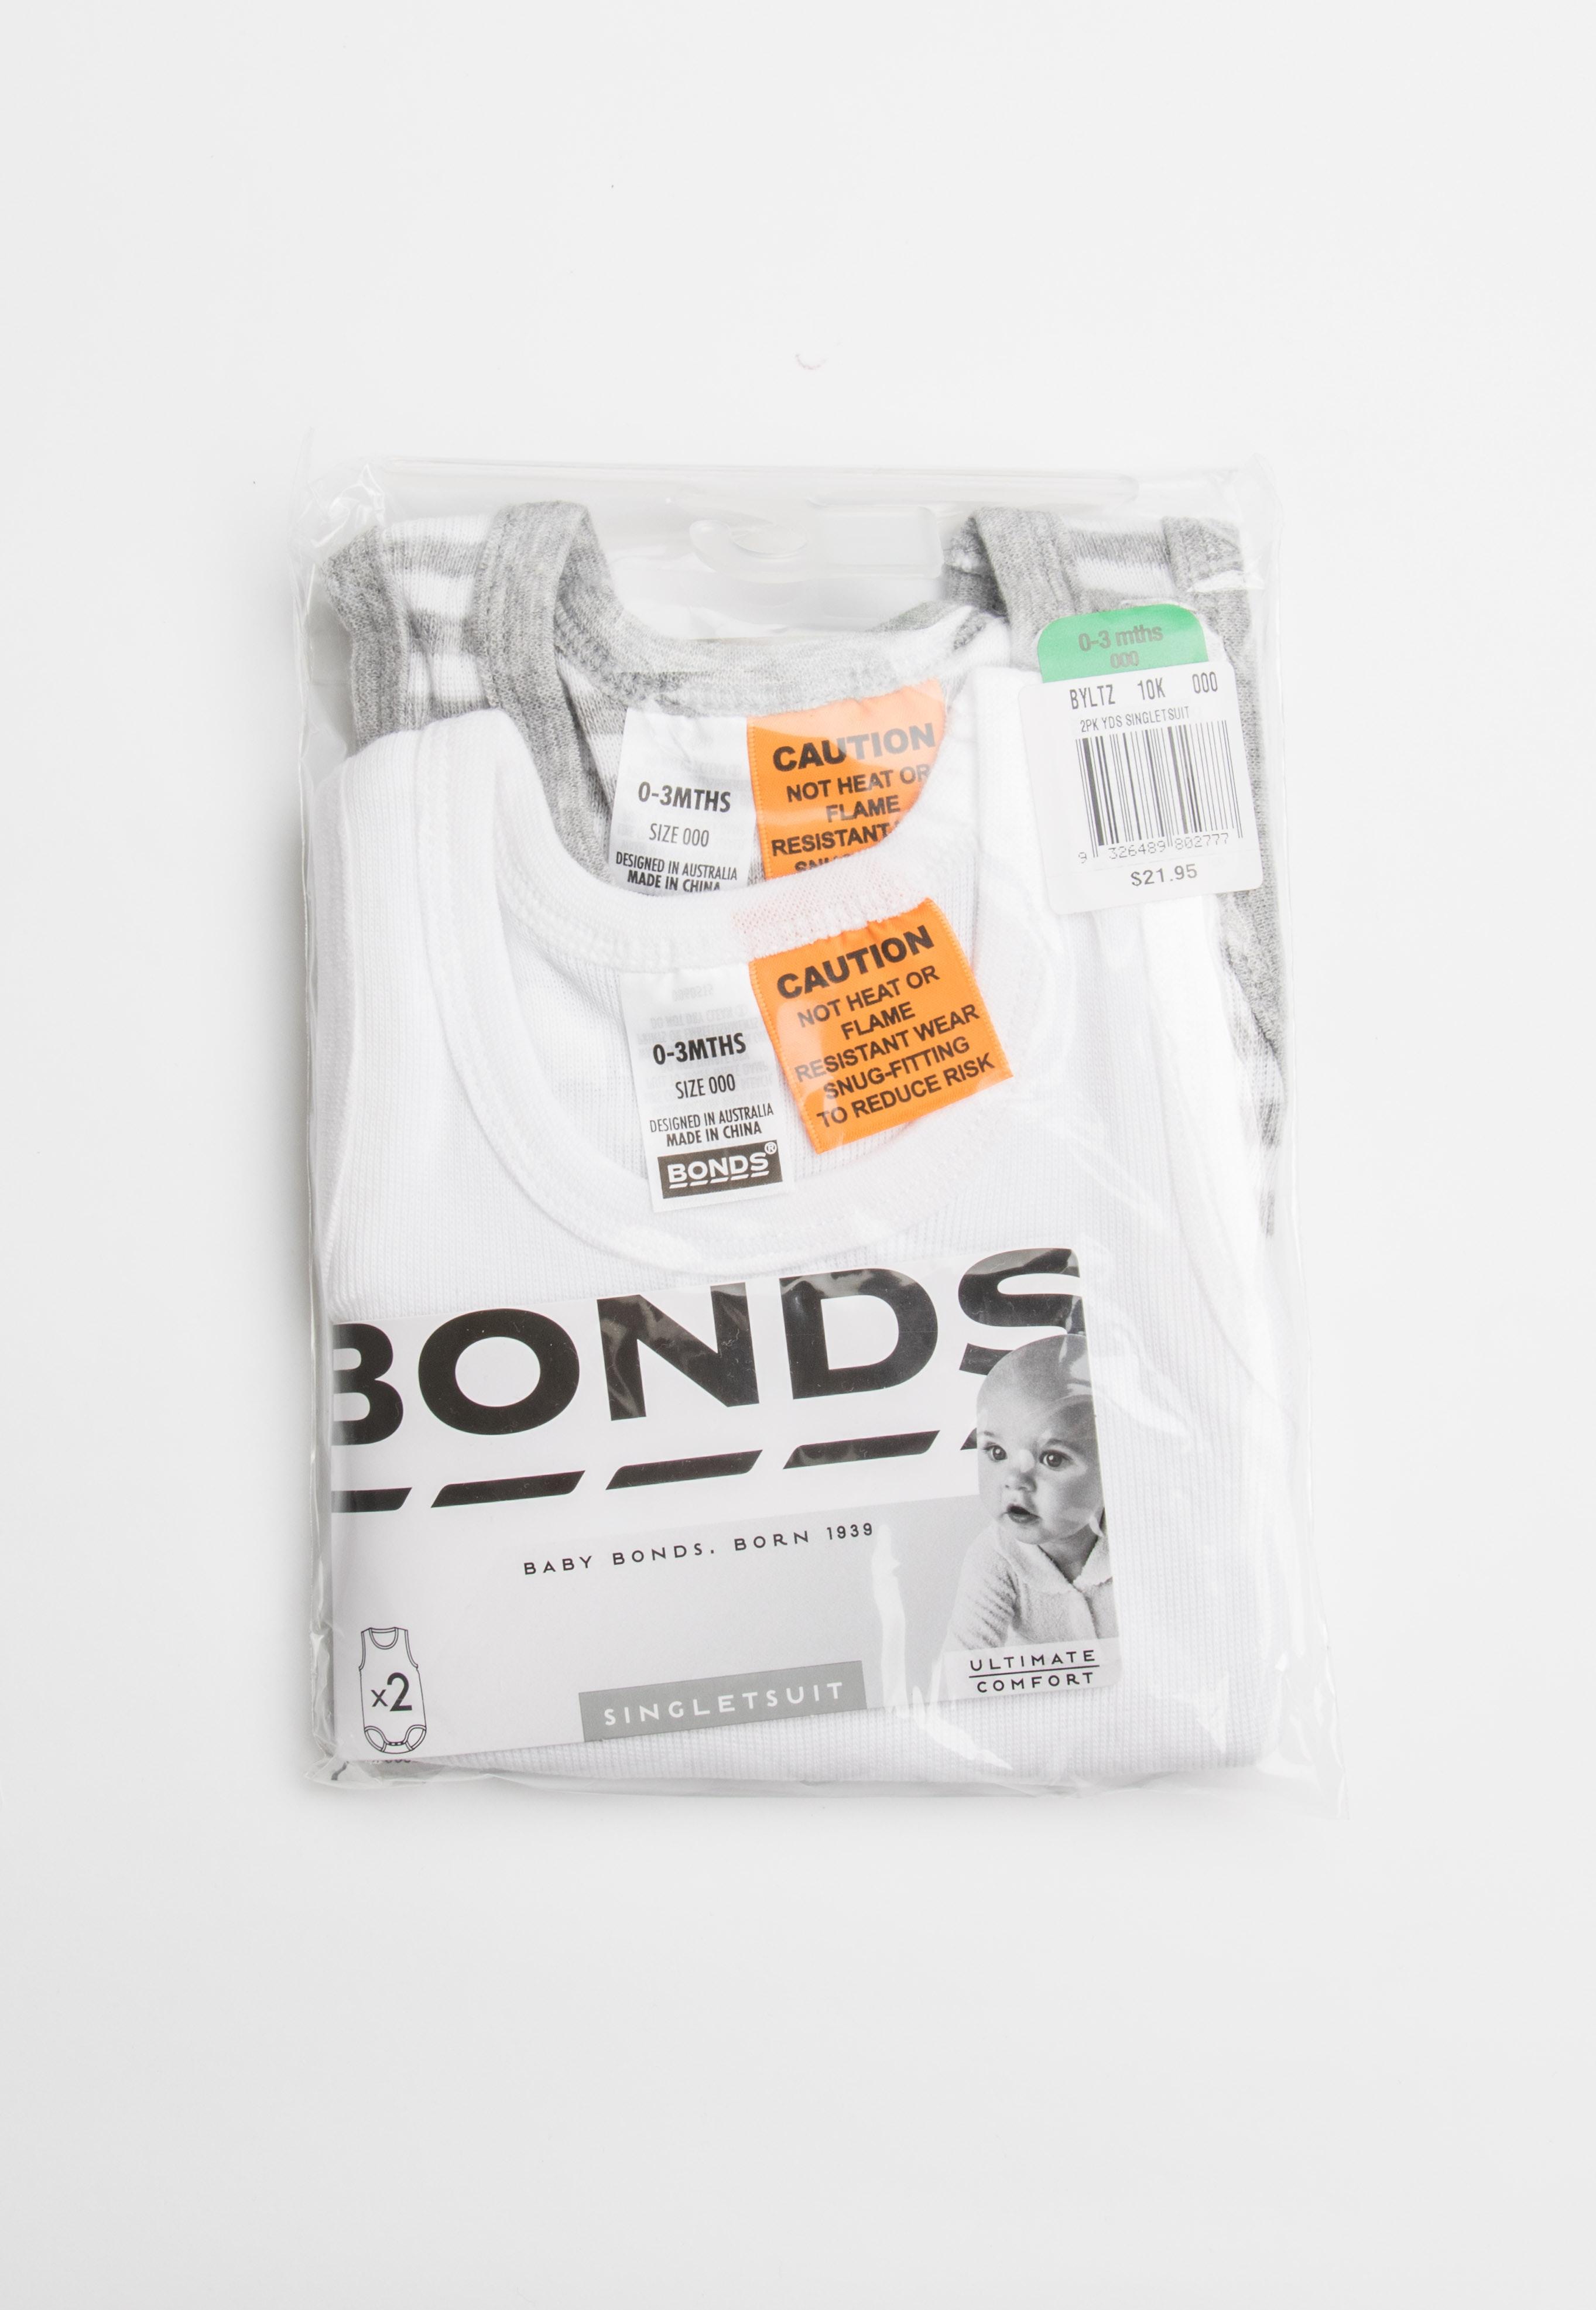 BONDS - 2Pk Singletsuit - Pack 10